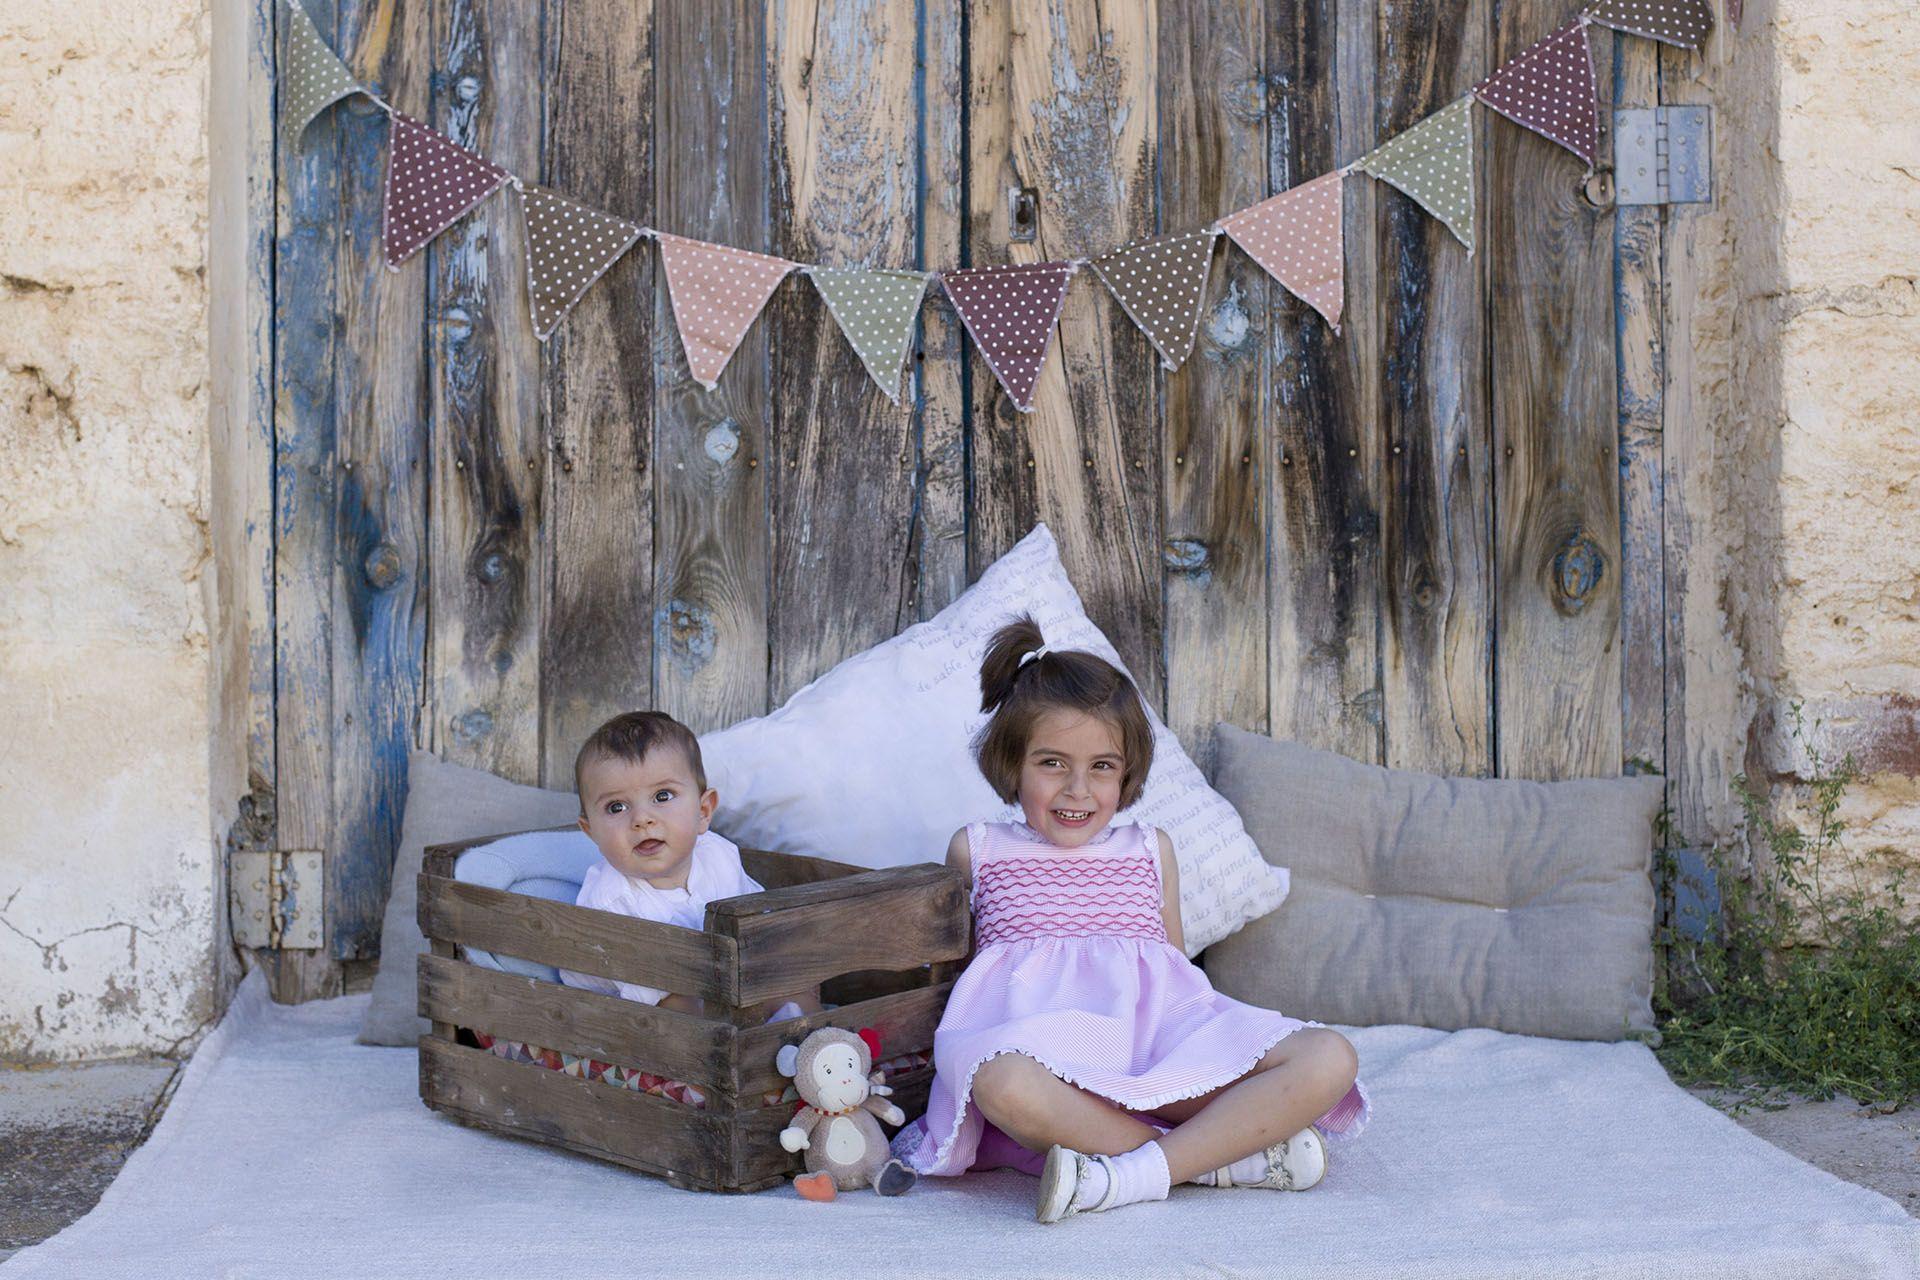 angela coronel-fotografia-sesion infantil-molina de aragon-martina roque